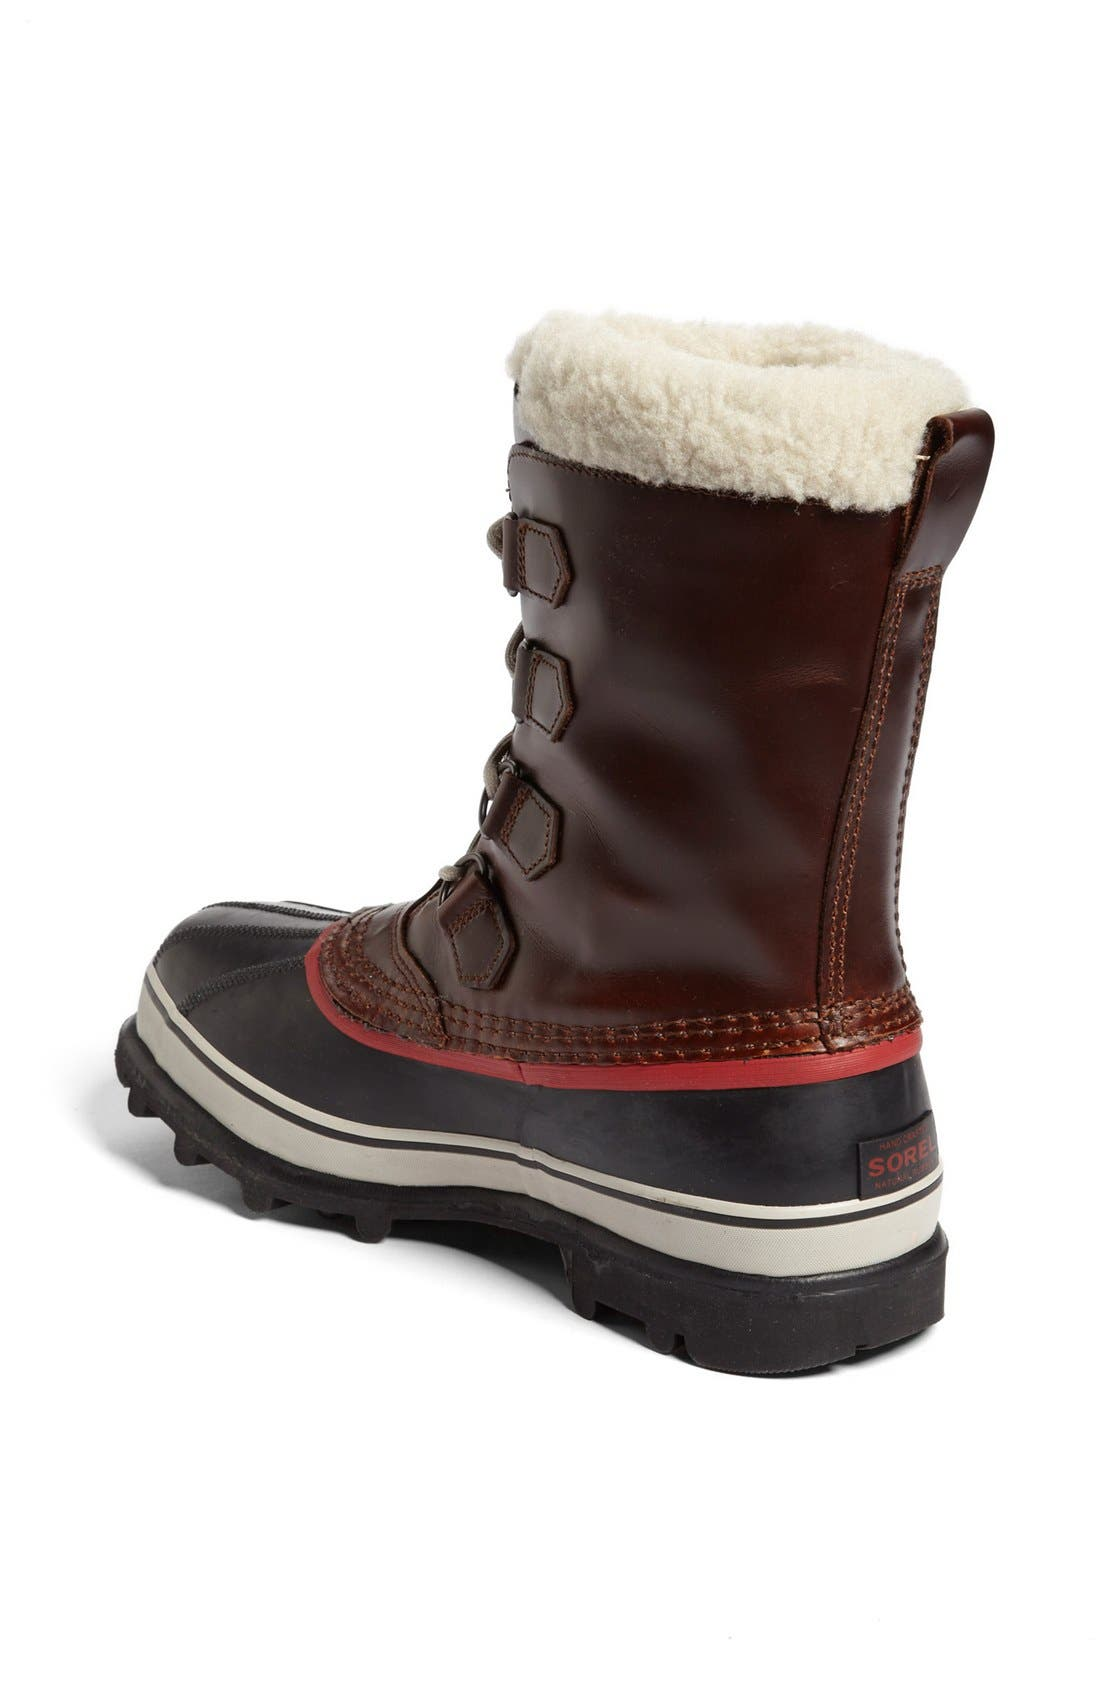 SOREL, 'Caribou' Snow Boot, Alternate thumbnail 2, color, 219